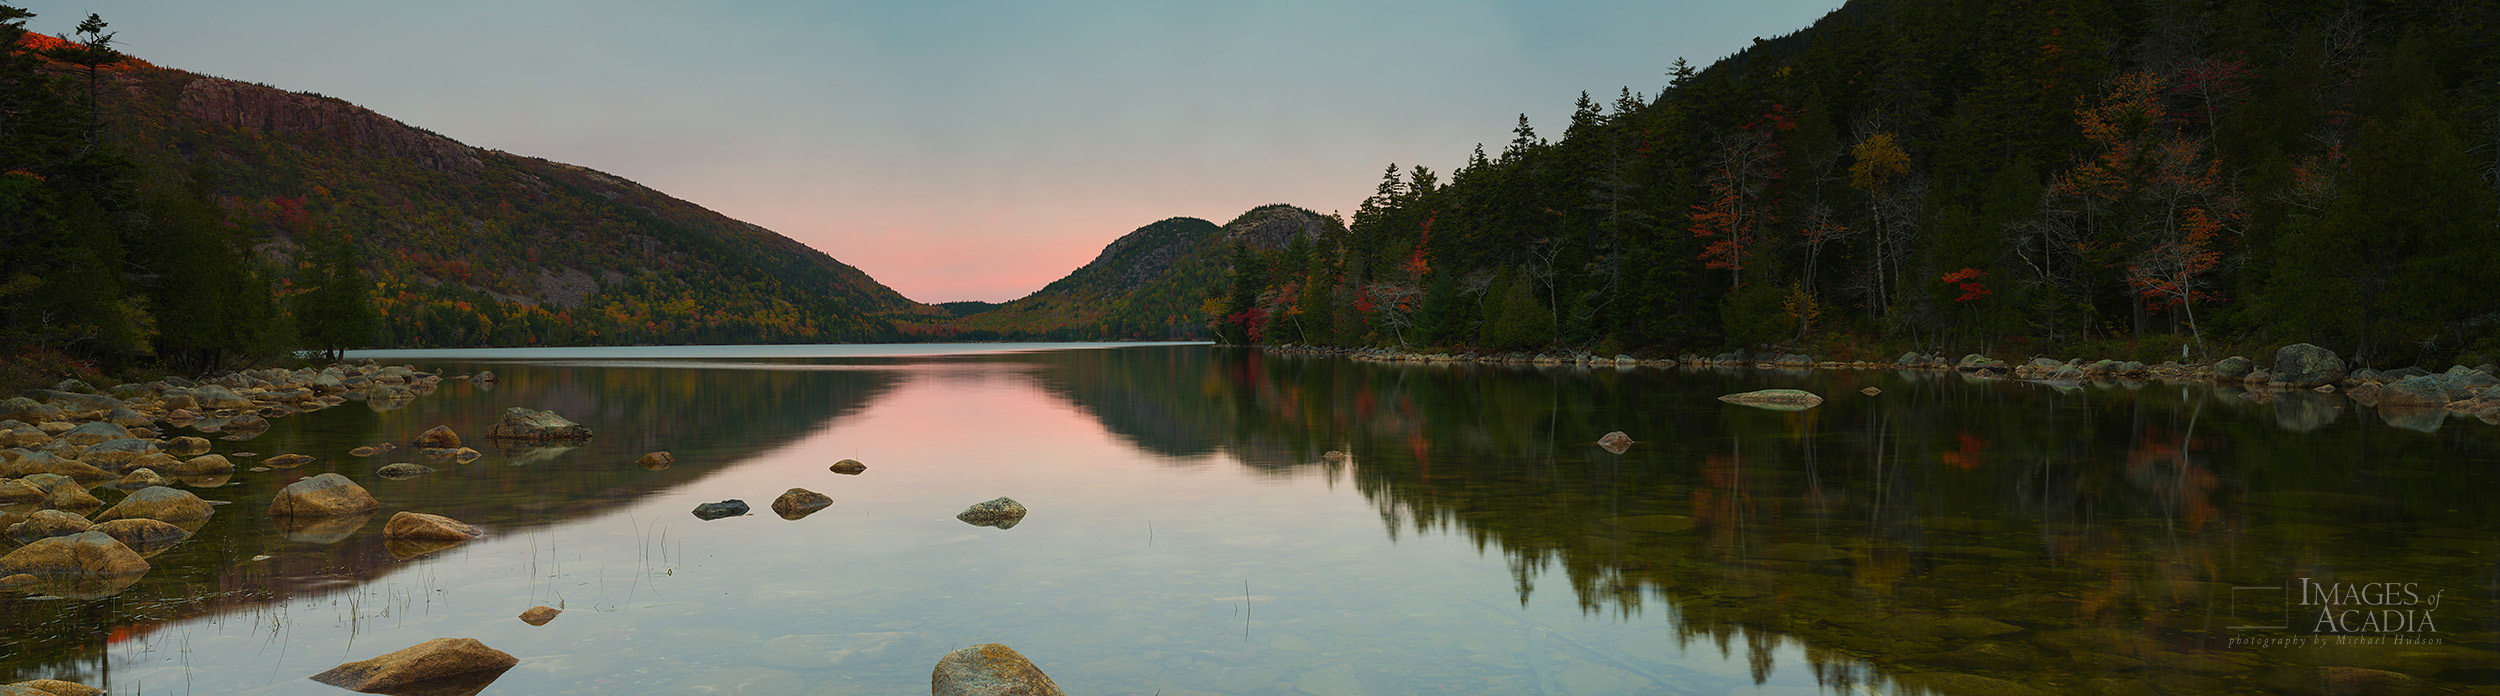 Early morning at Jordan Pond